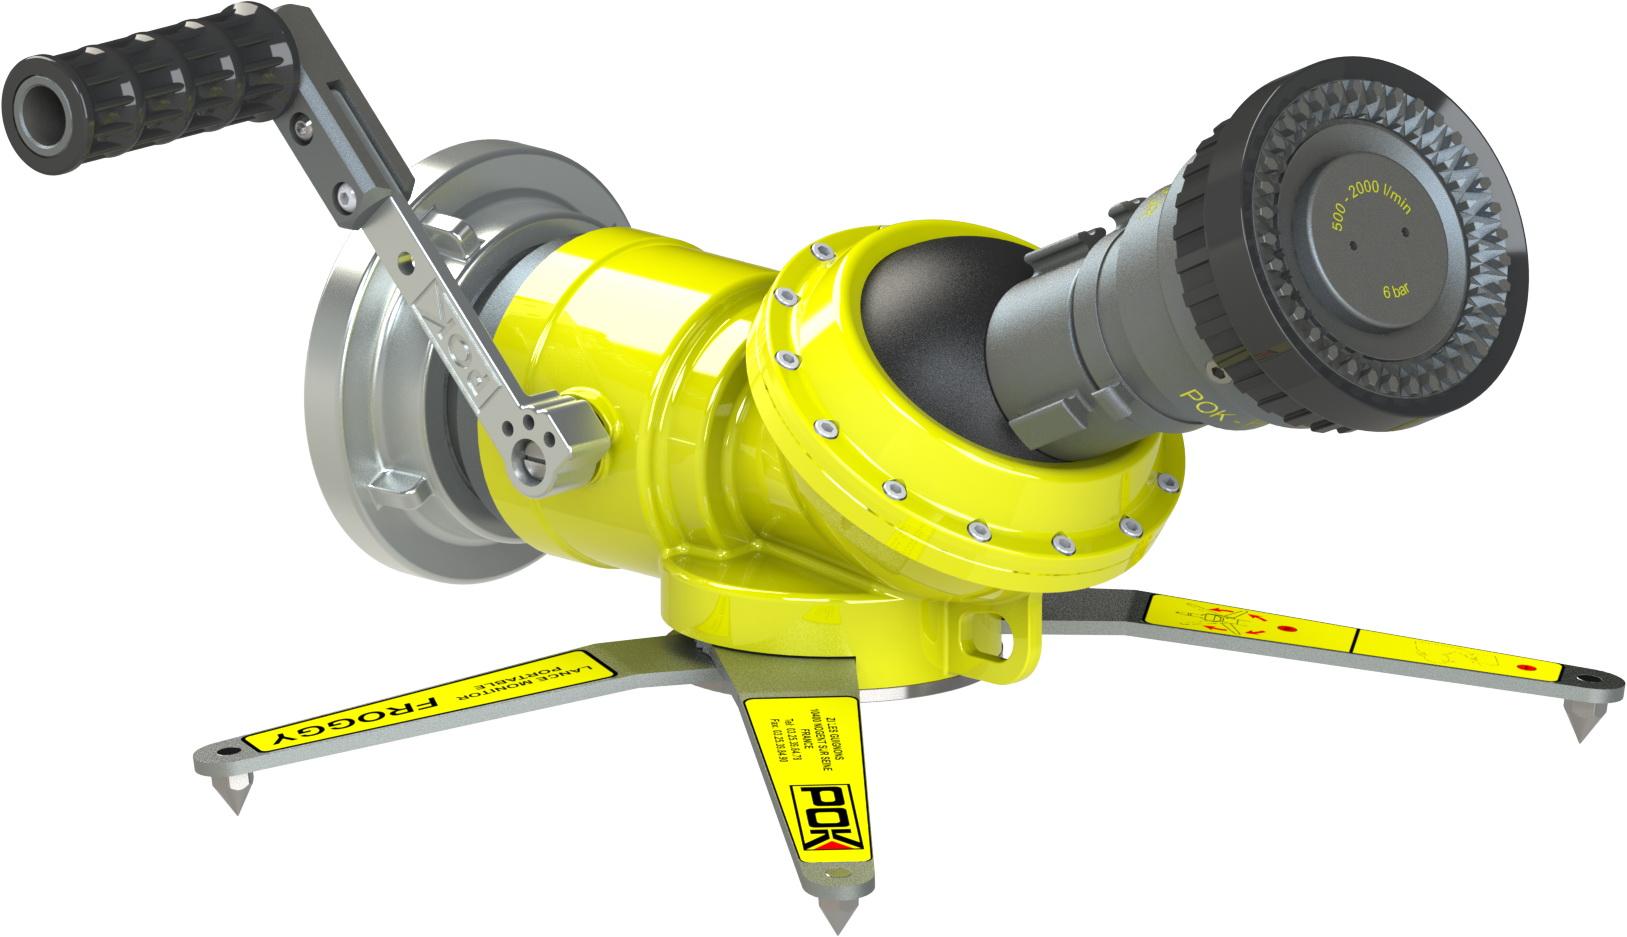 Froggy Tactical - Tragbarer Wasserwerfer 1200